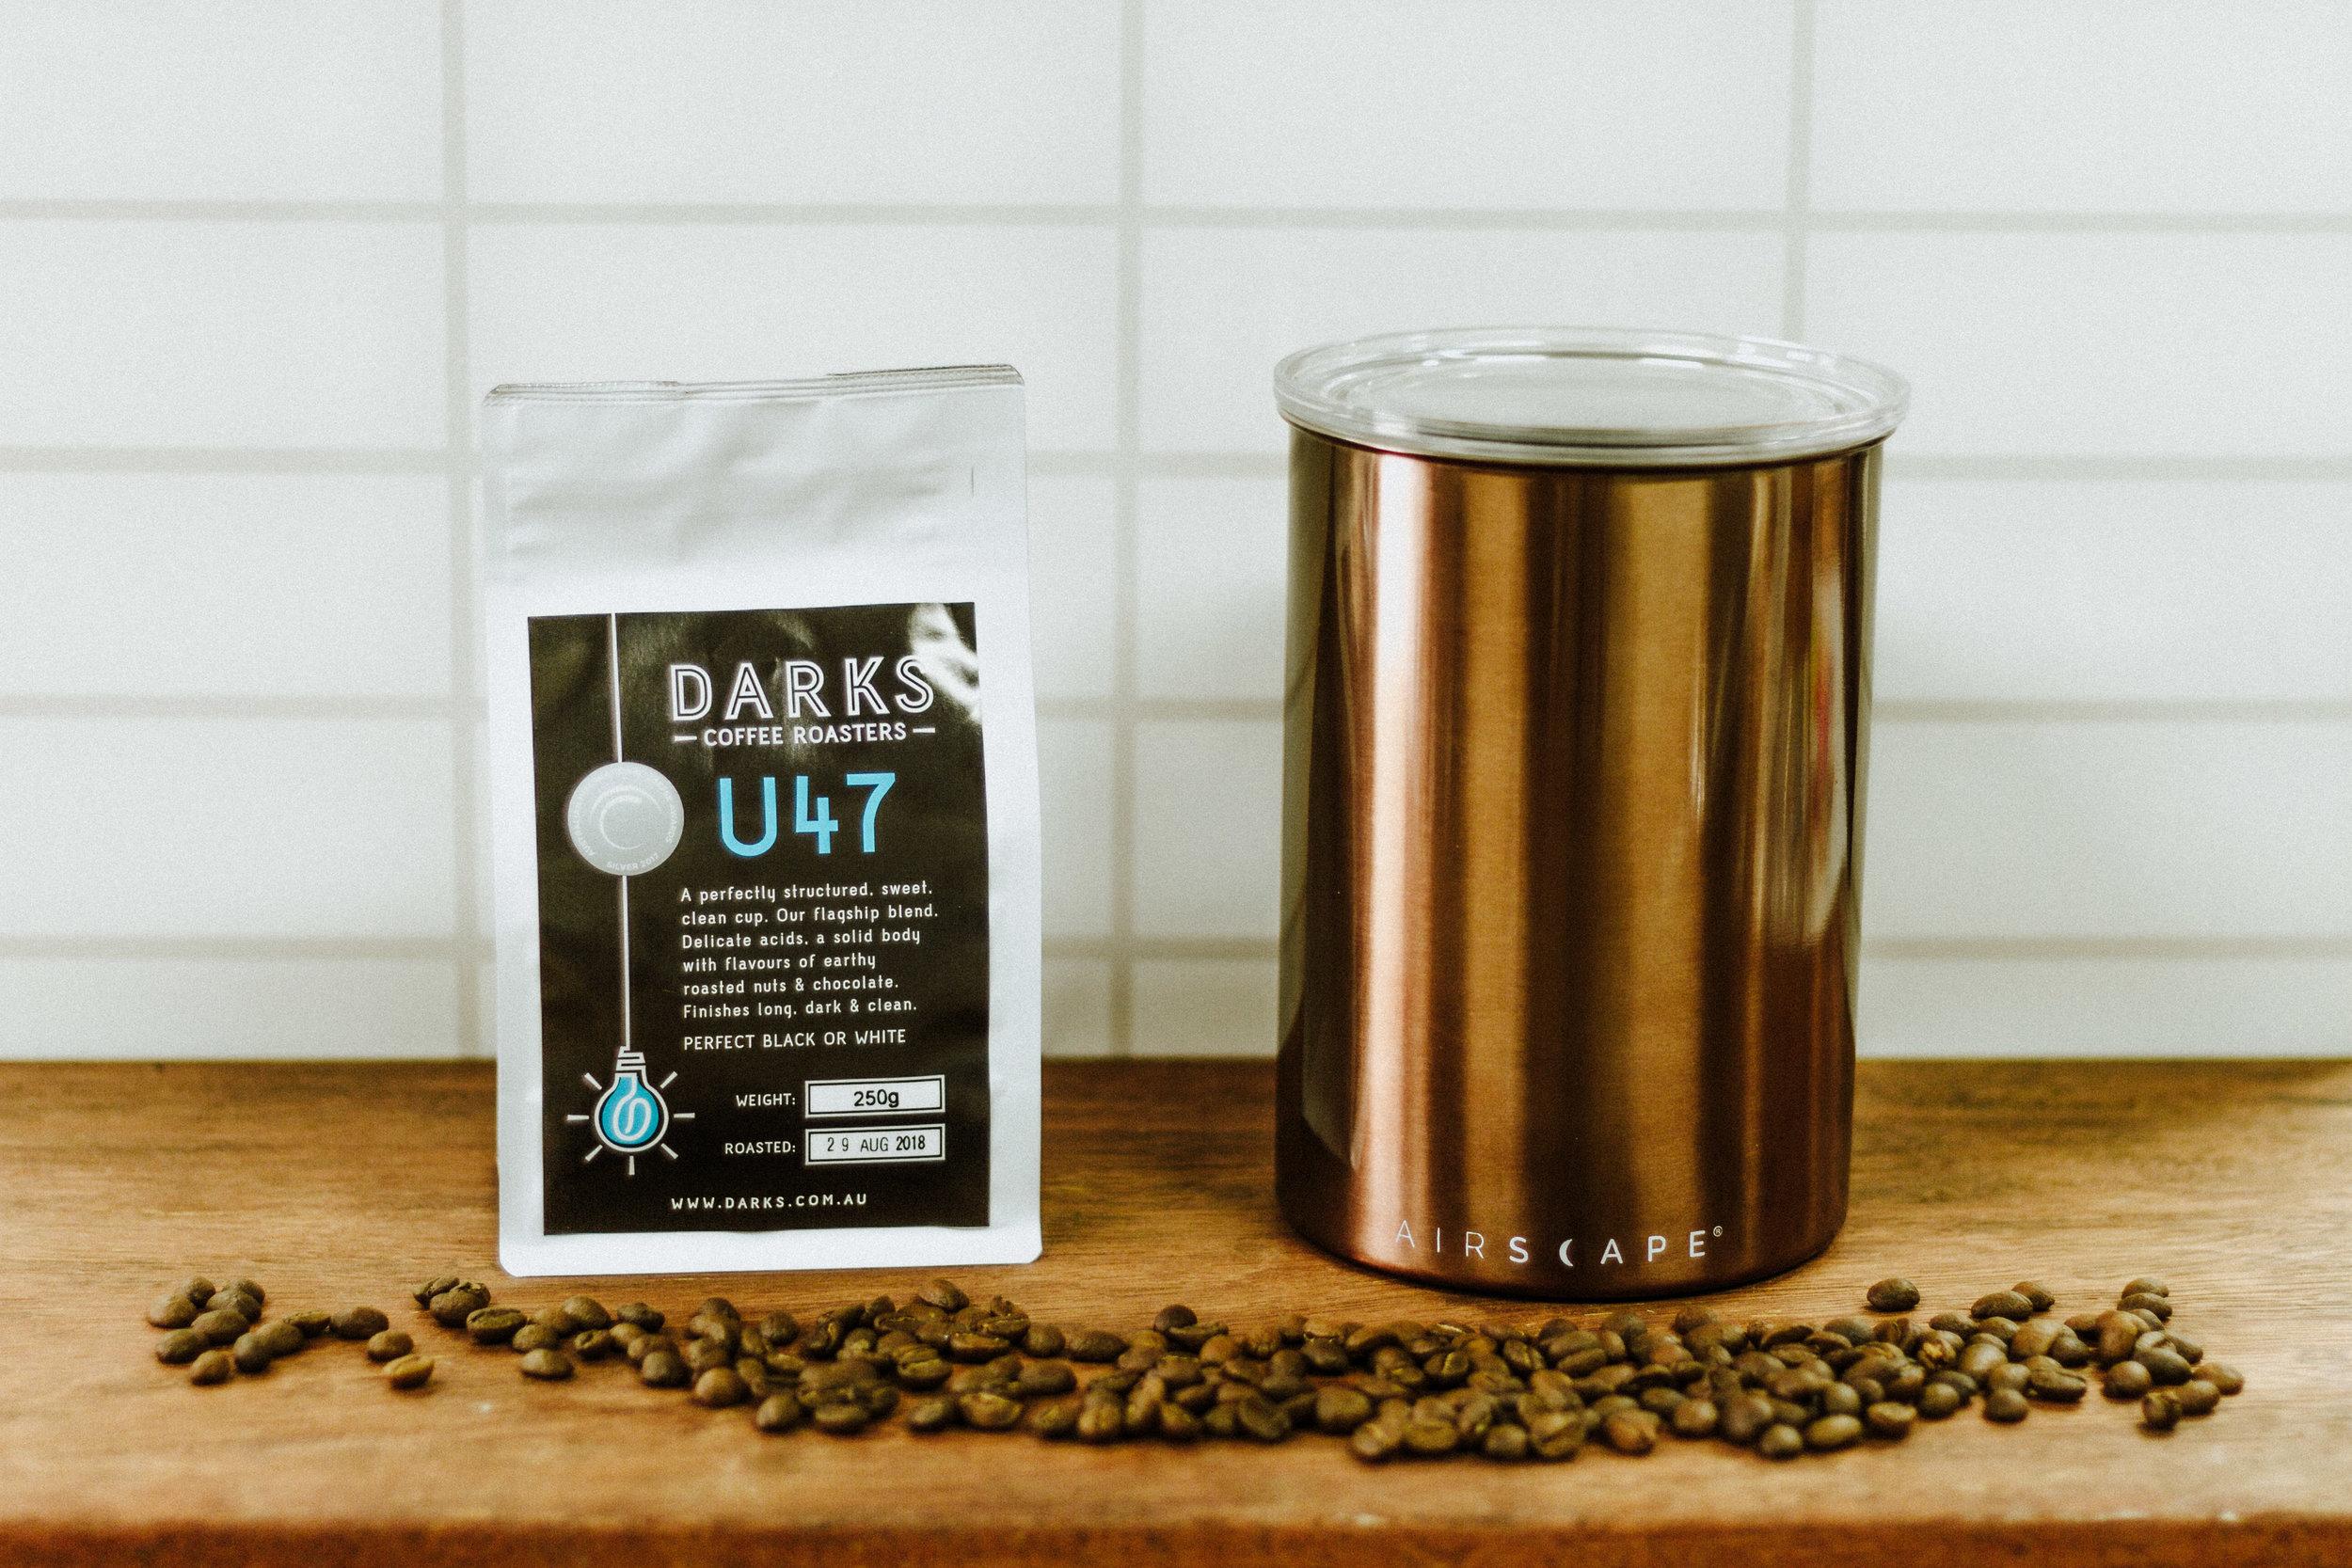 storecoffee-darkscoffeeroasters-1-3.jpg